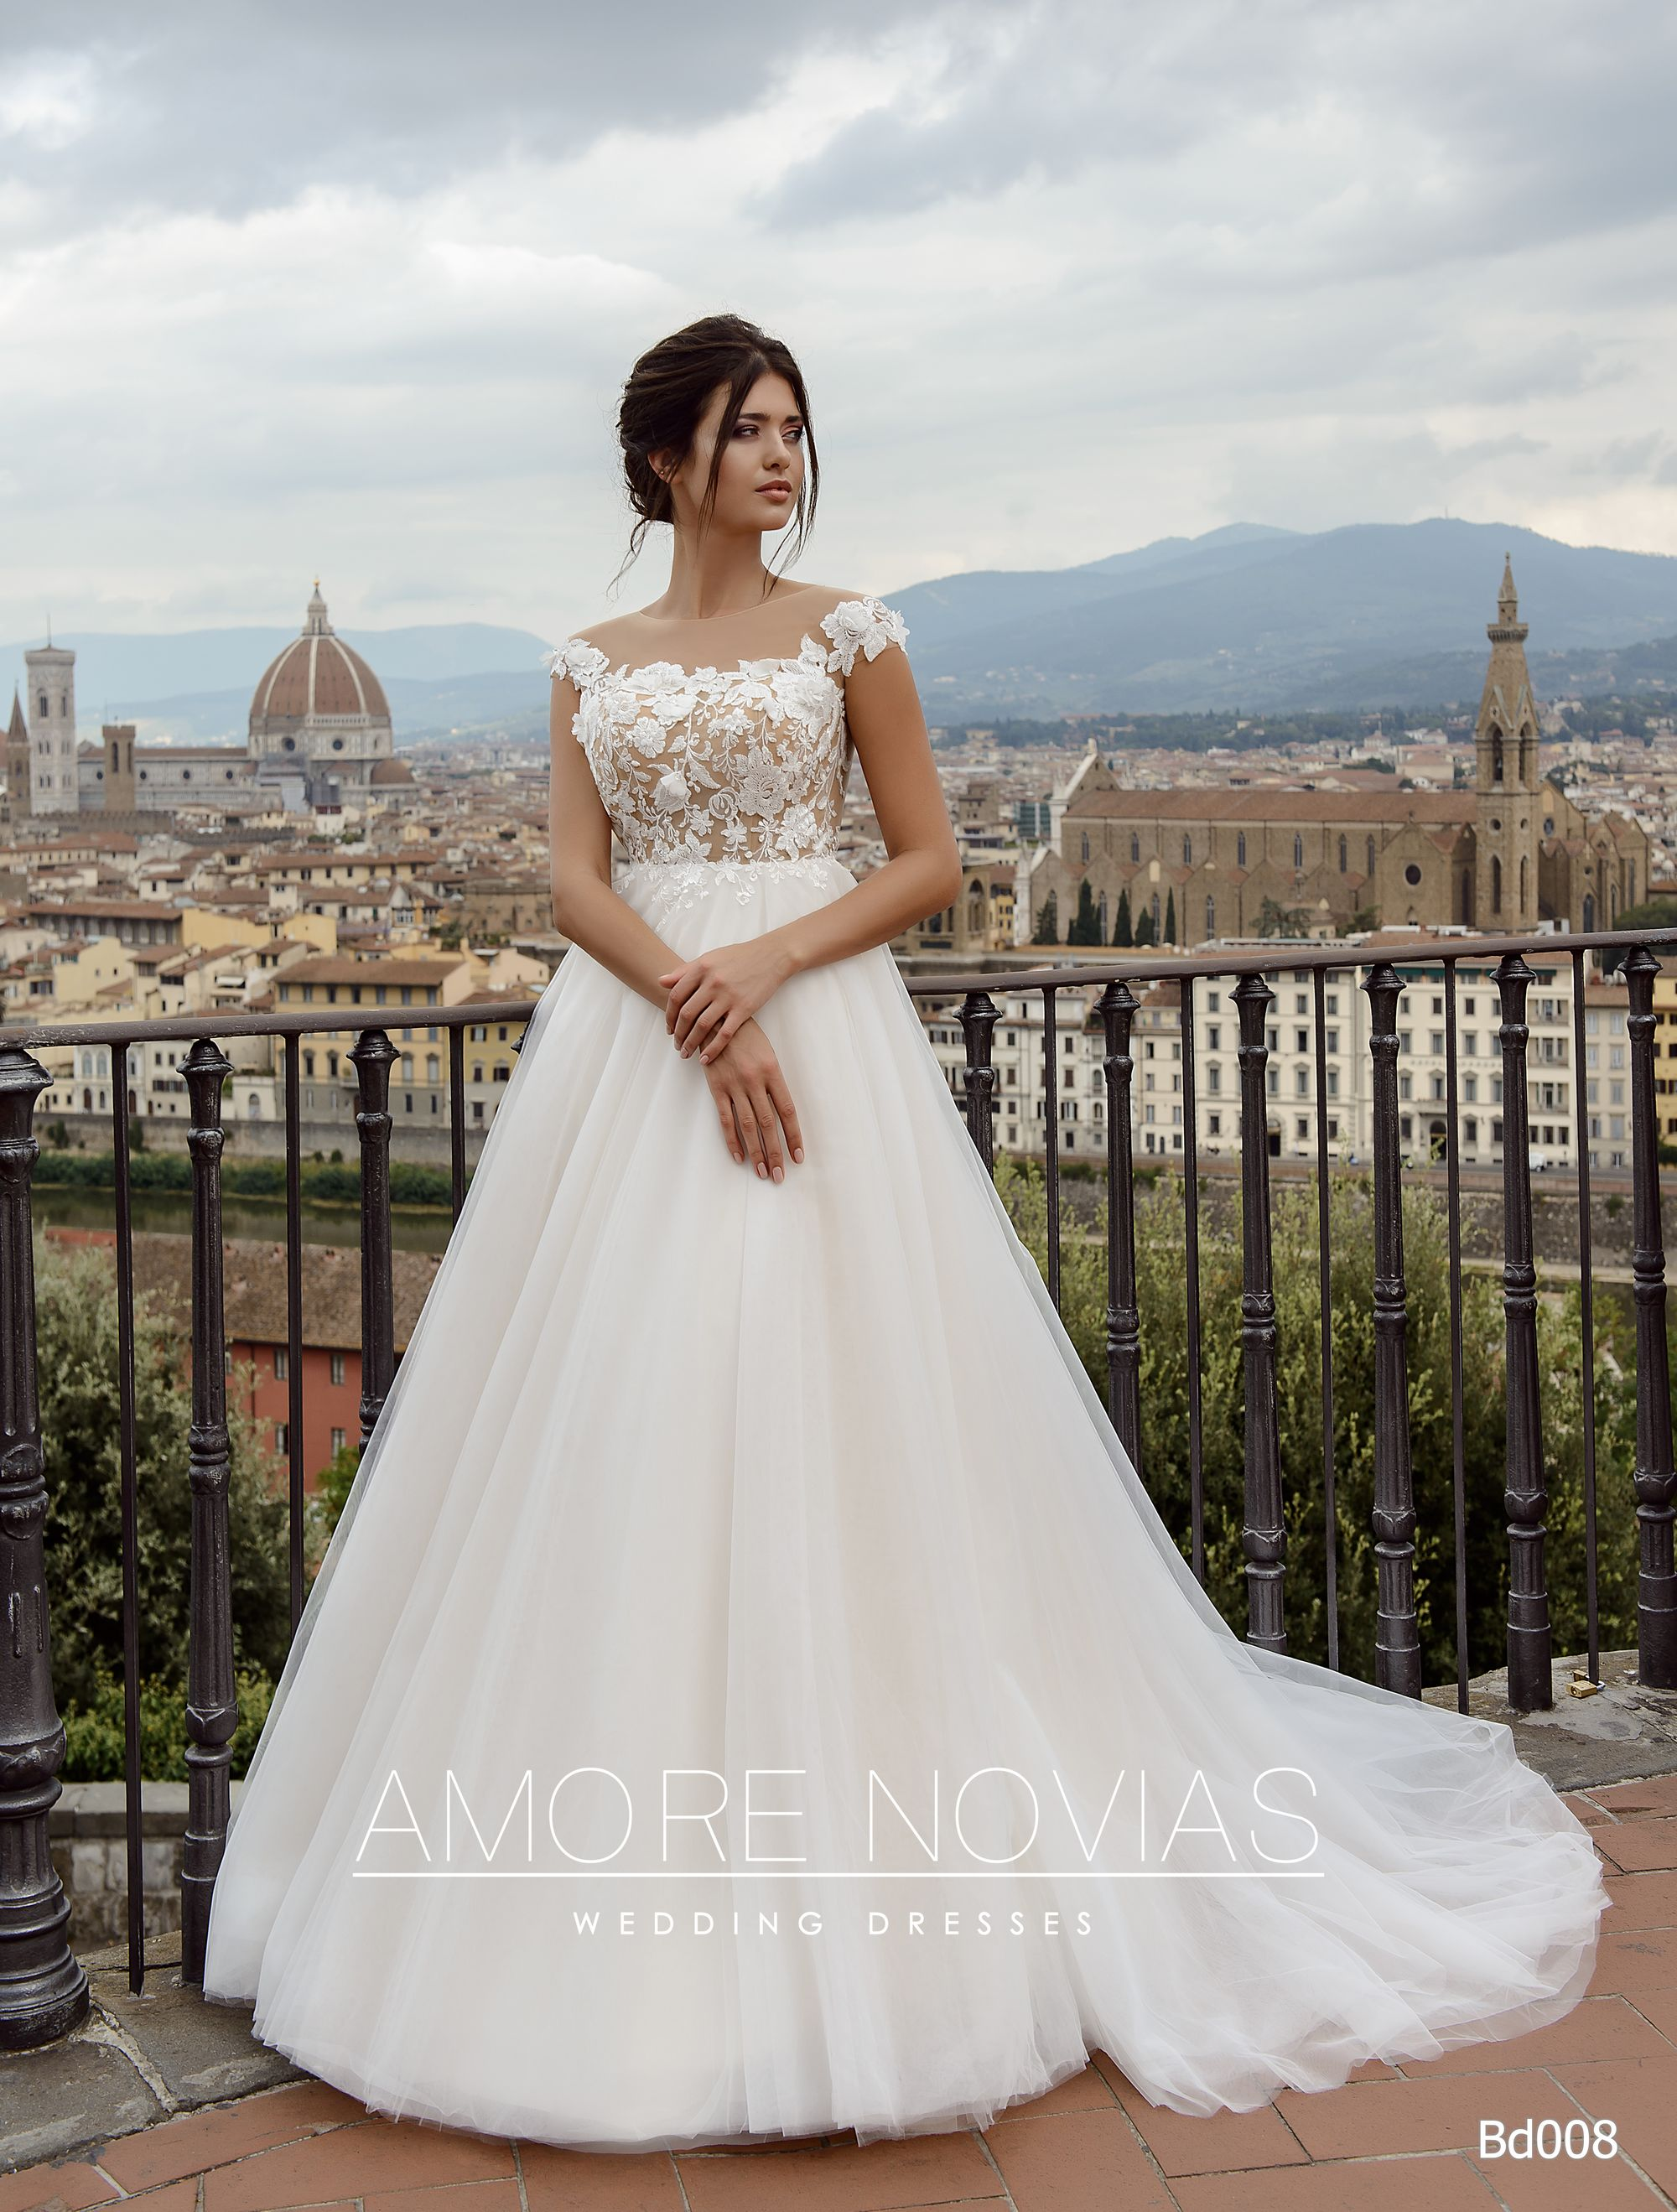 https://amore-novias.com/images/stories/virtuemart/product/bd008-------(1).jpg